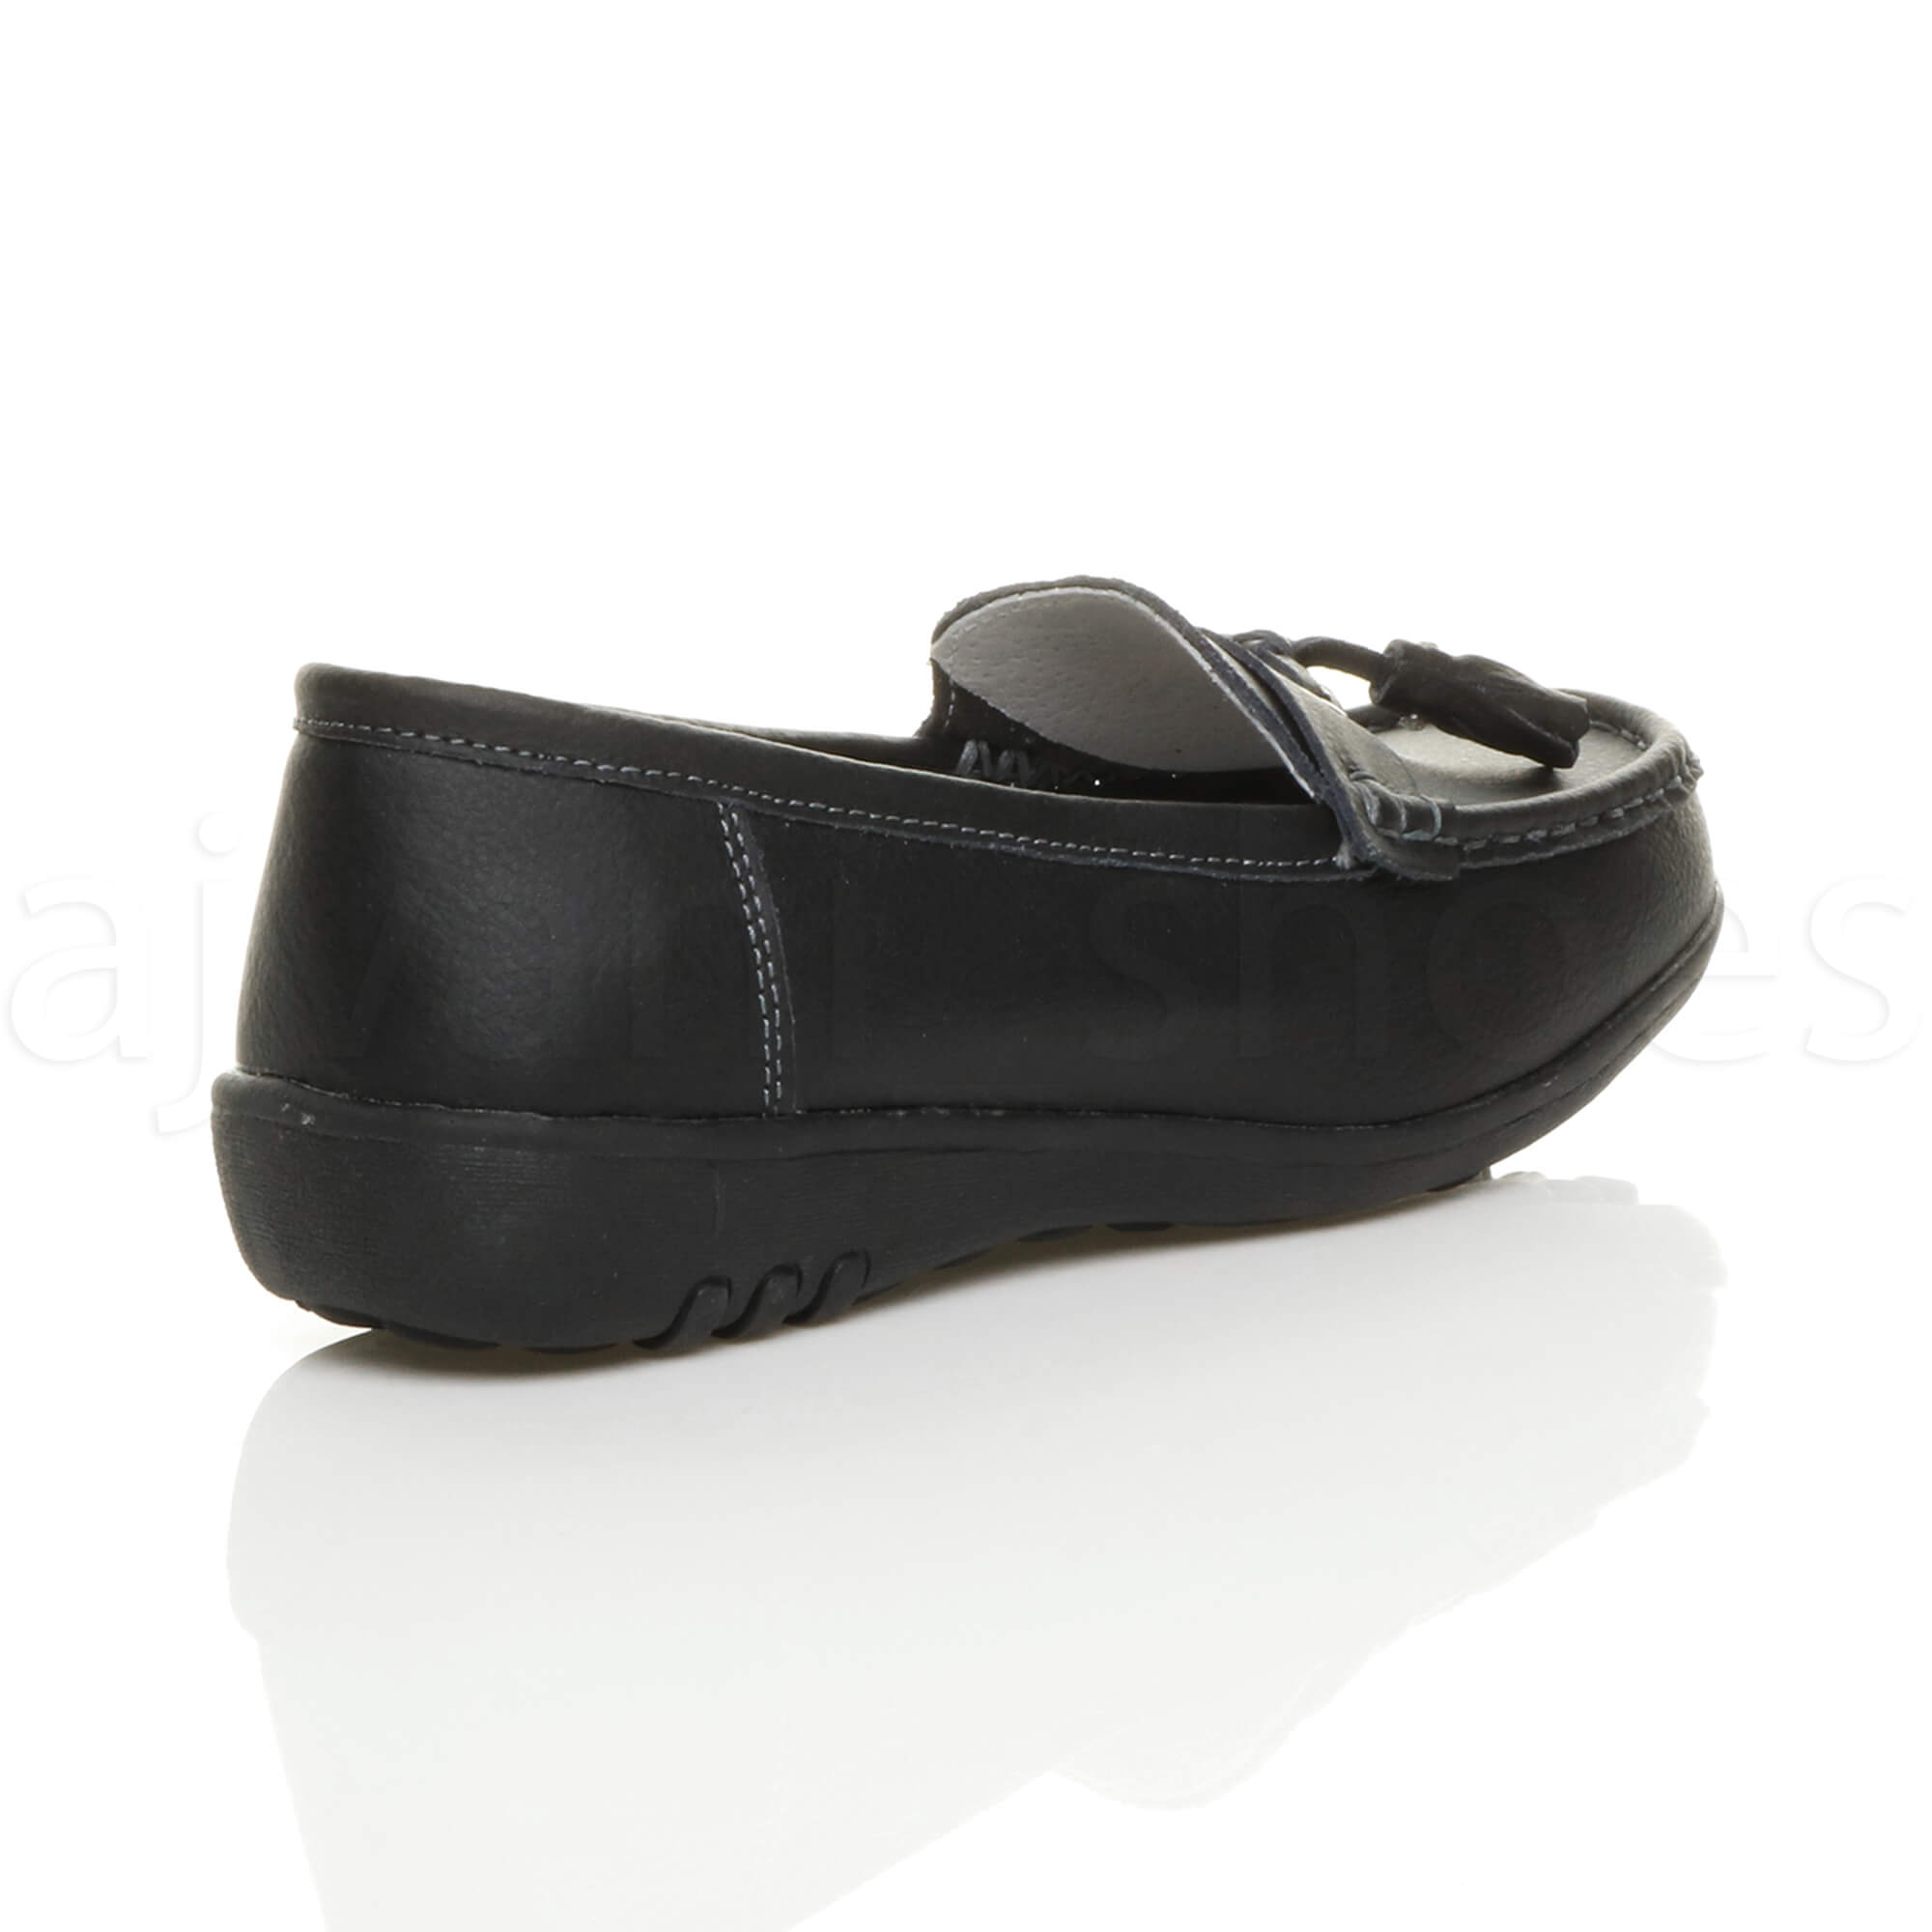 Ladies Wedge Boat Shoes